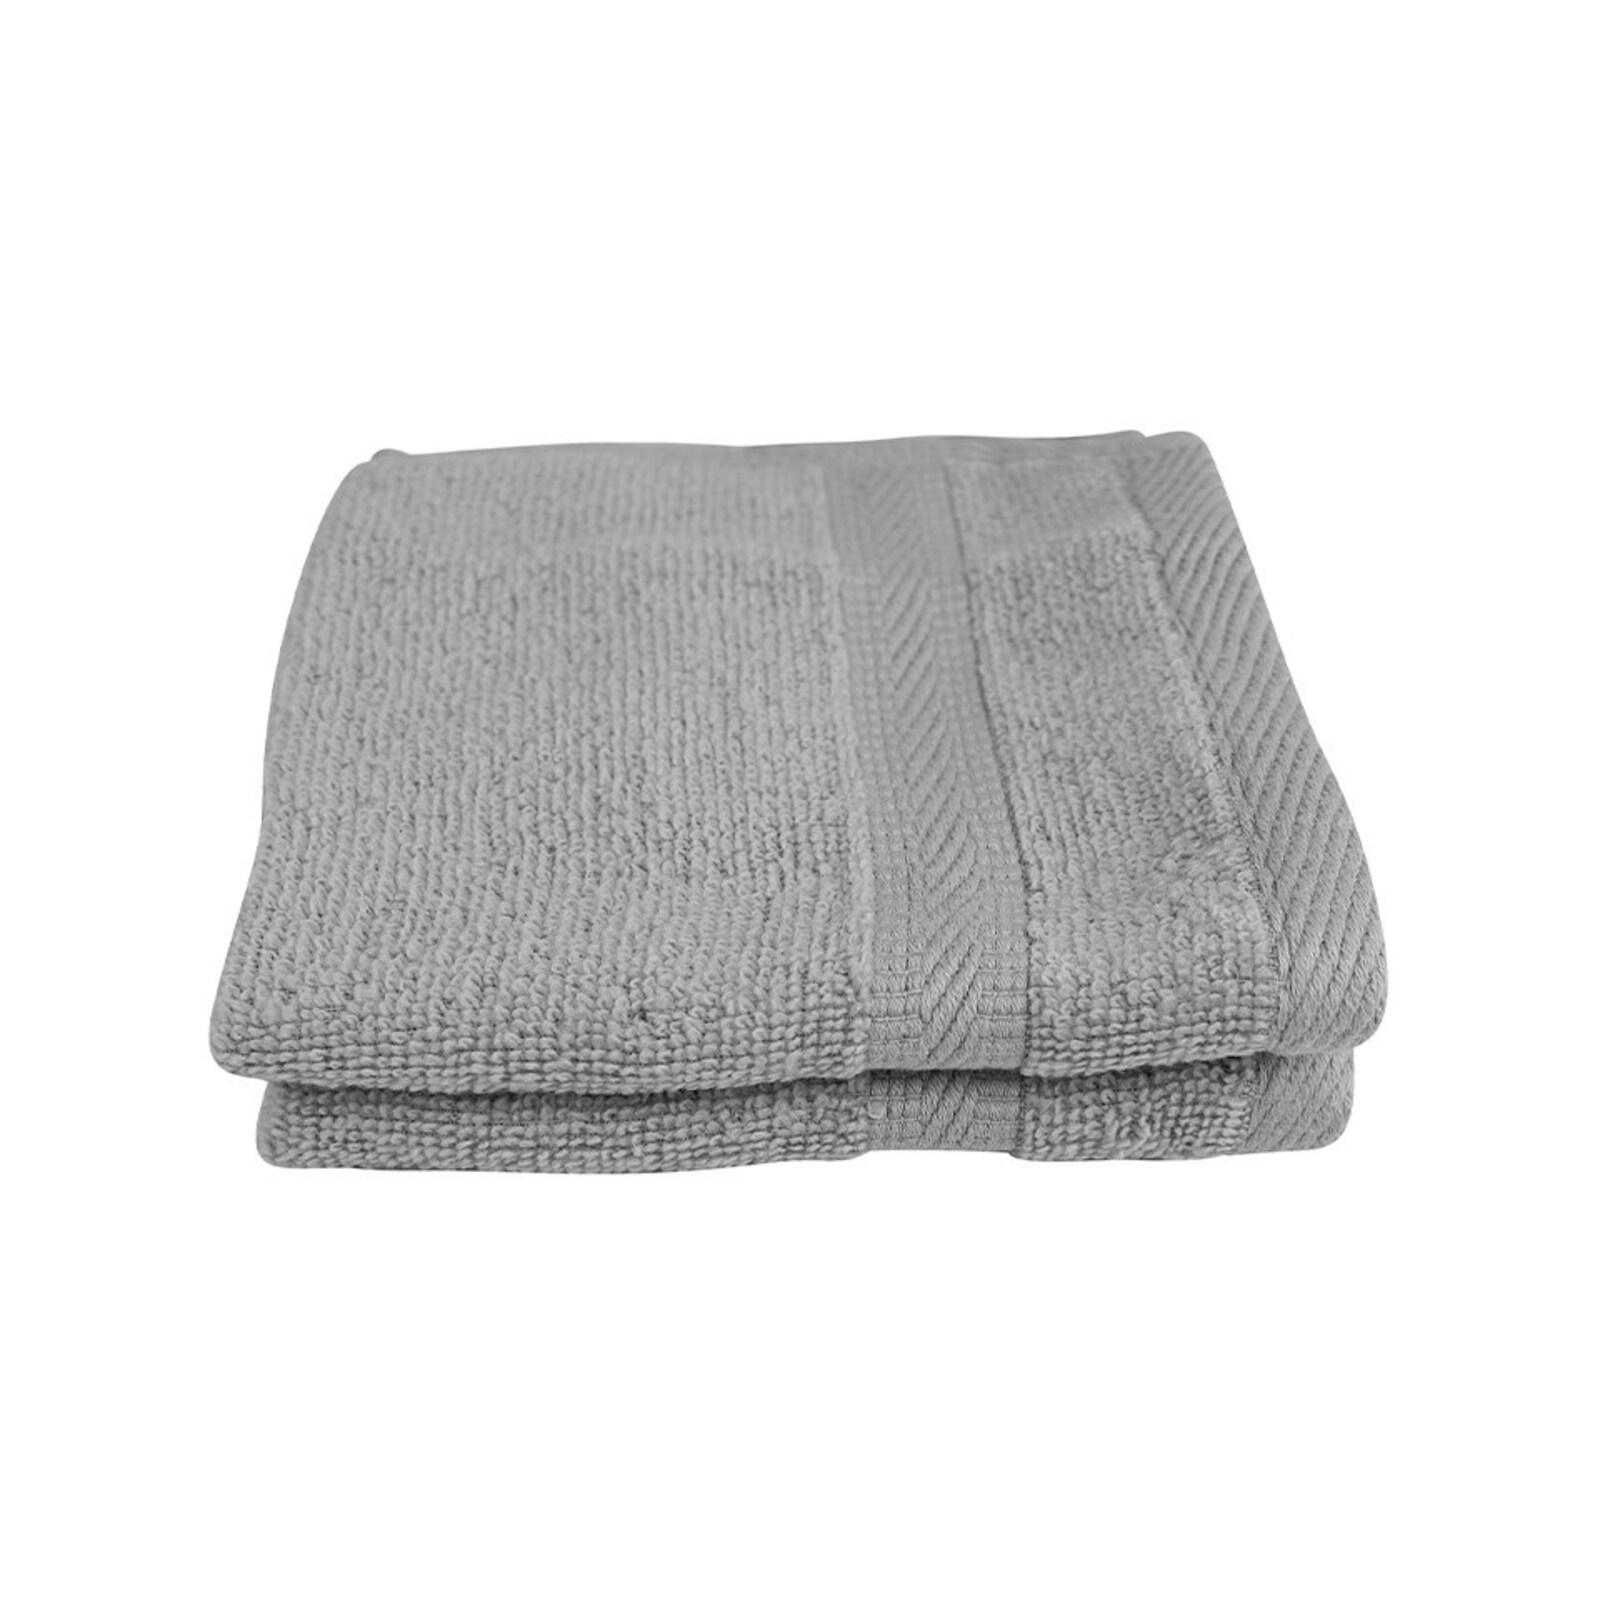 Odyssey Living Bondi Zero Twist Cotton Silver Oasis Face Washer 2 Pack